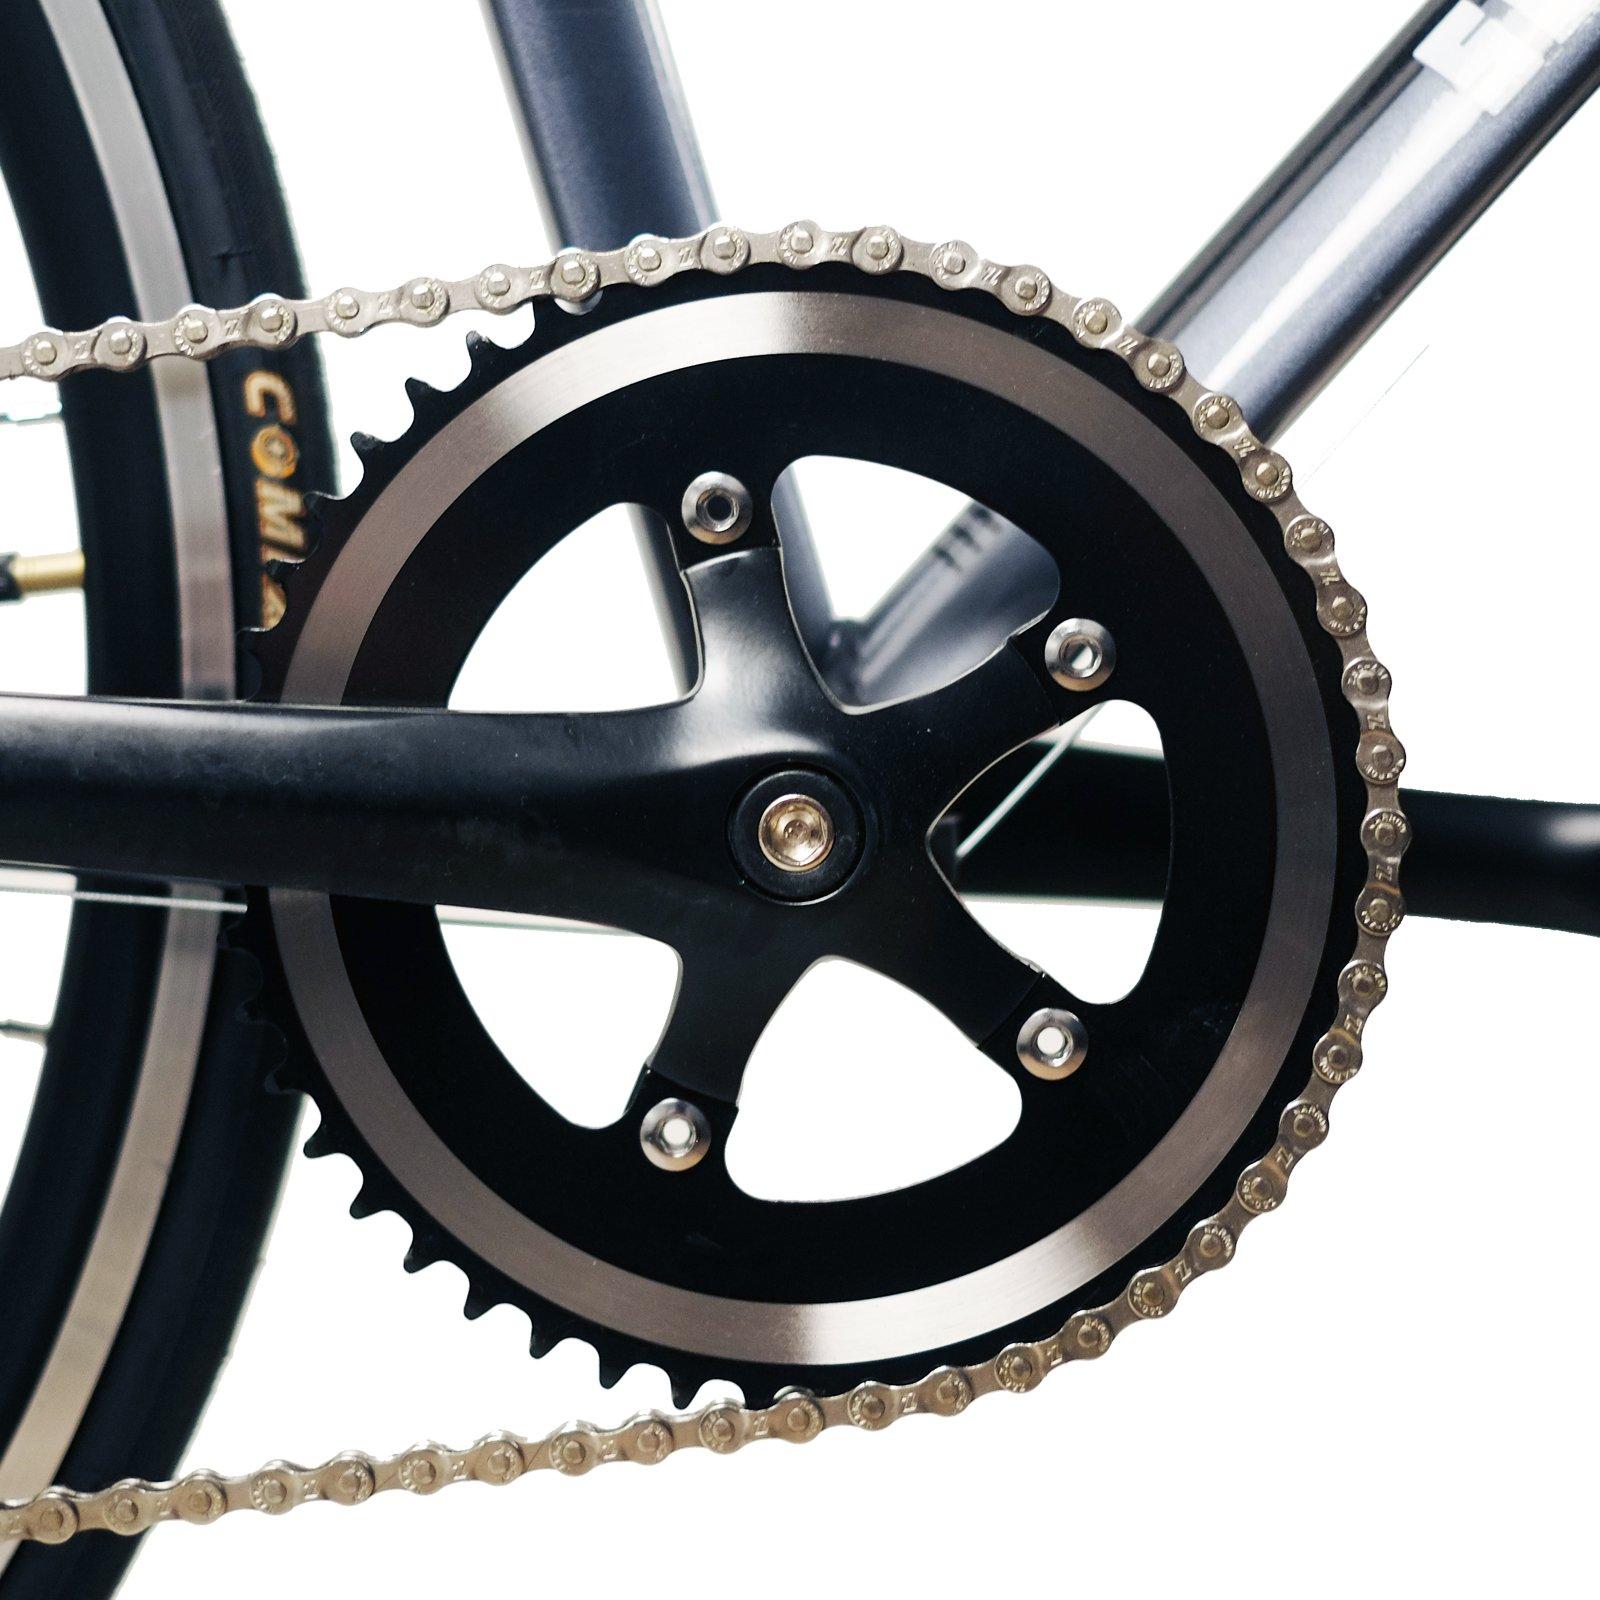 Solomone Cavalli Lightweight Classic Sports 8 Speed 700C Medium Road Bicycle Bike w/Shimano Derailleur by Solomone Cavalli (Image #6)